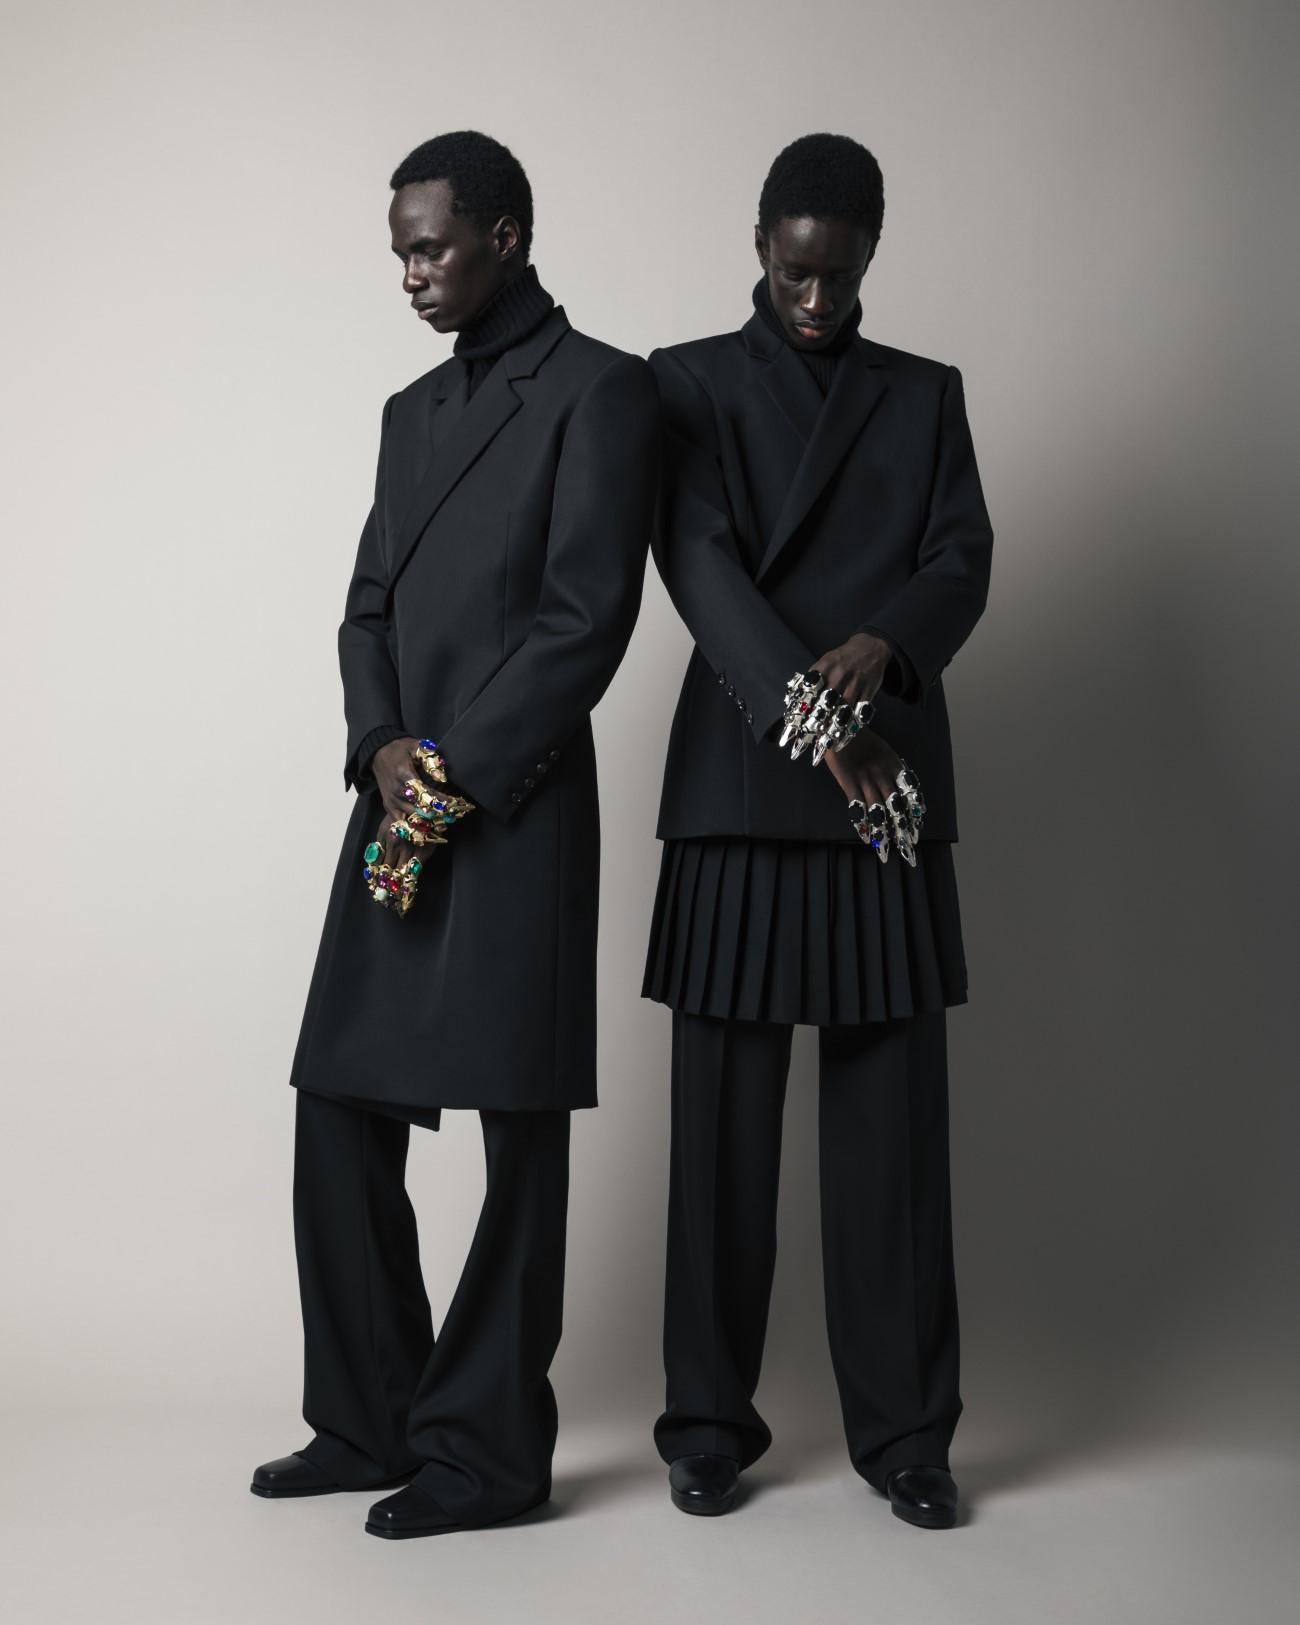 EGONlab - Automne-Hiver 2021 - Paris Fashion Week